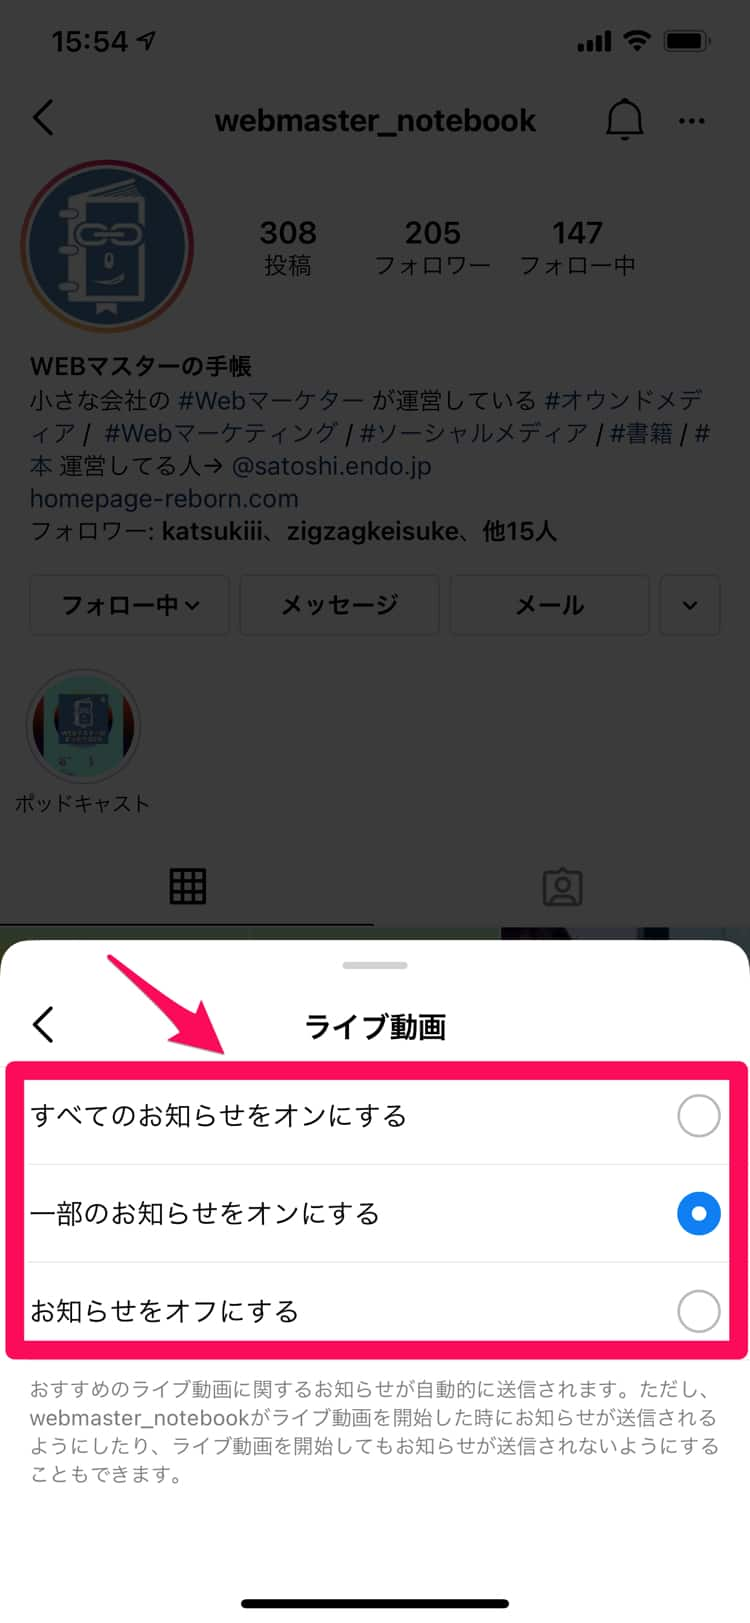 Instagramでライブ配信の通知をオンにする